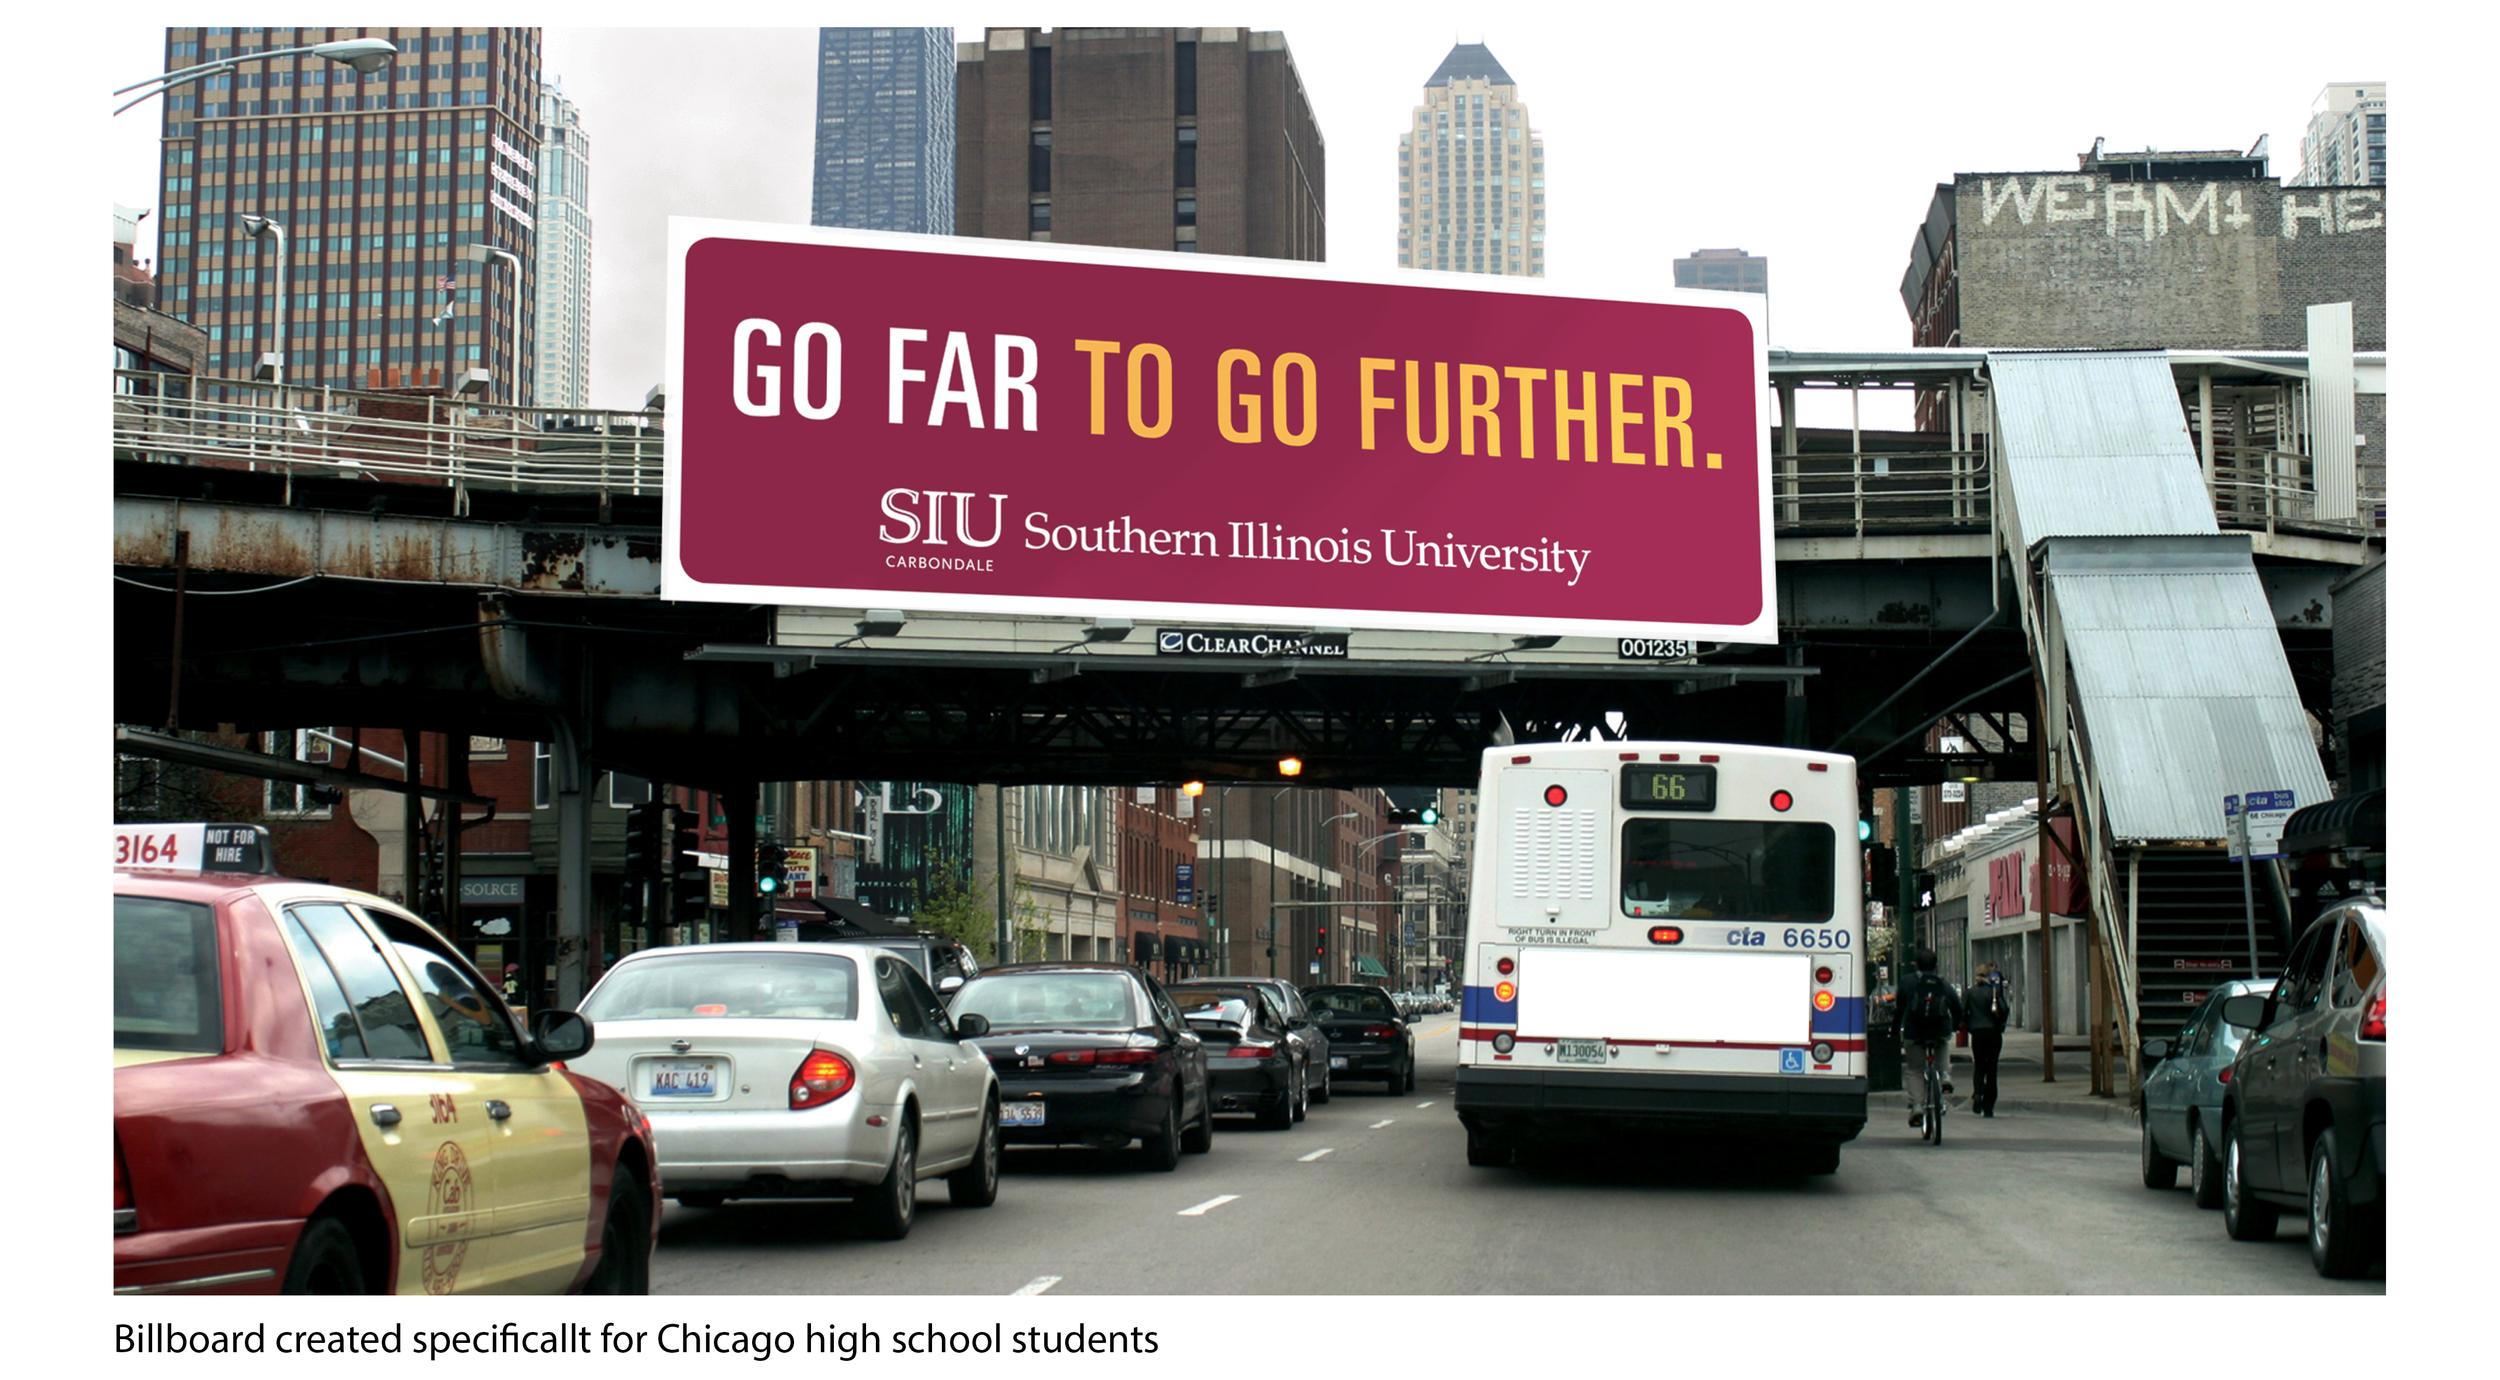 SIU_Marketing+AdvertisingSlides7.jpg